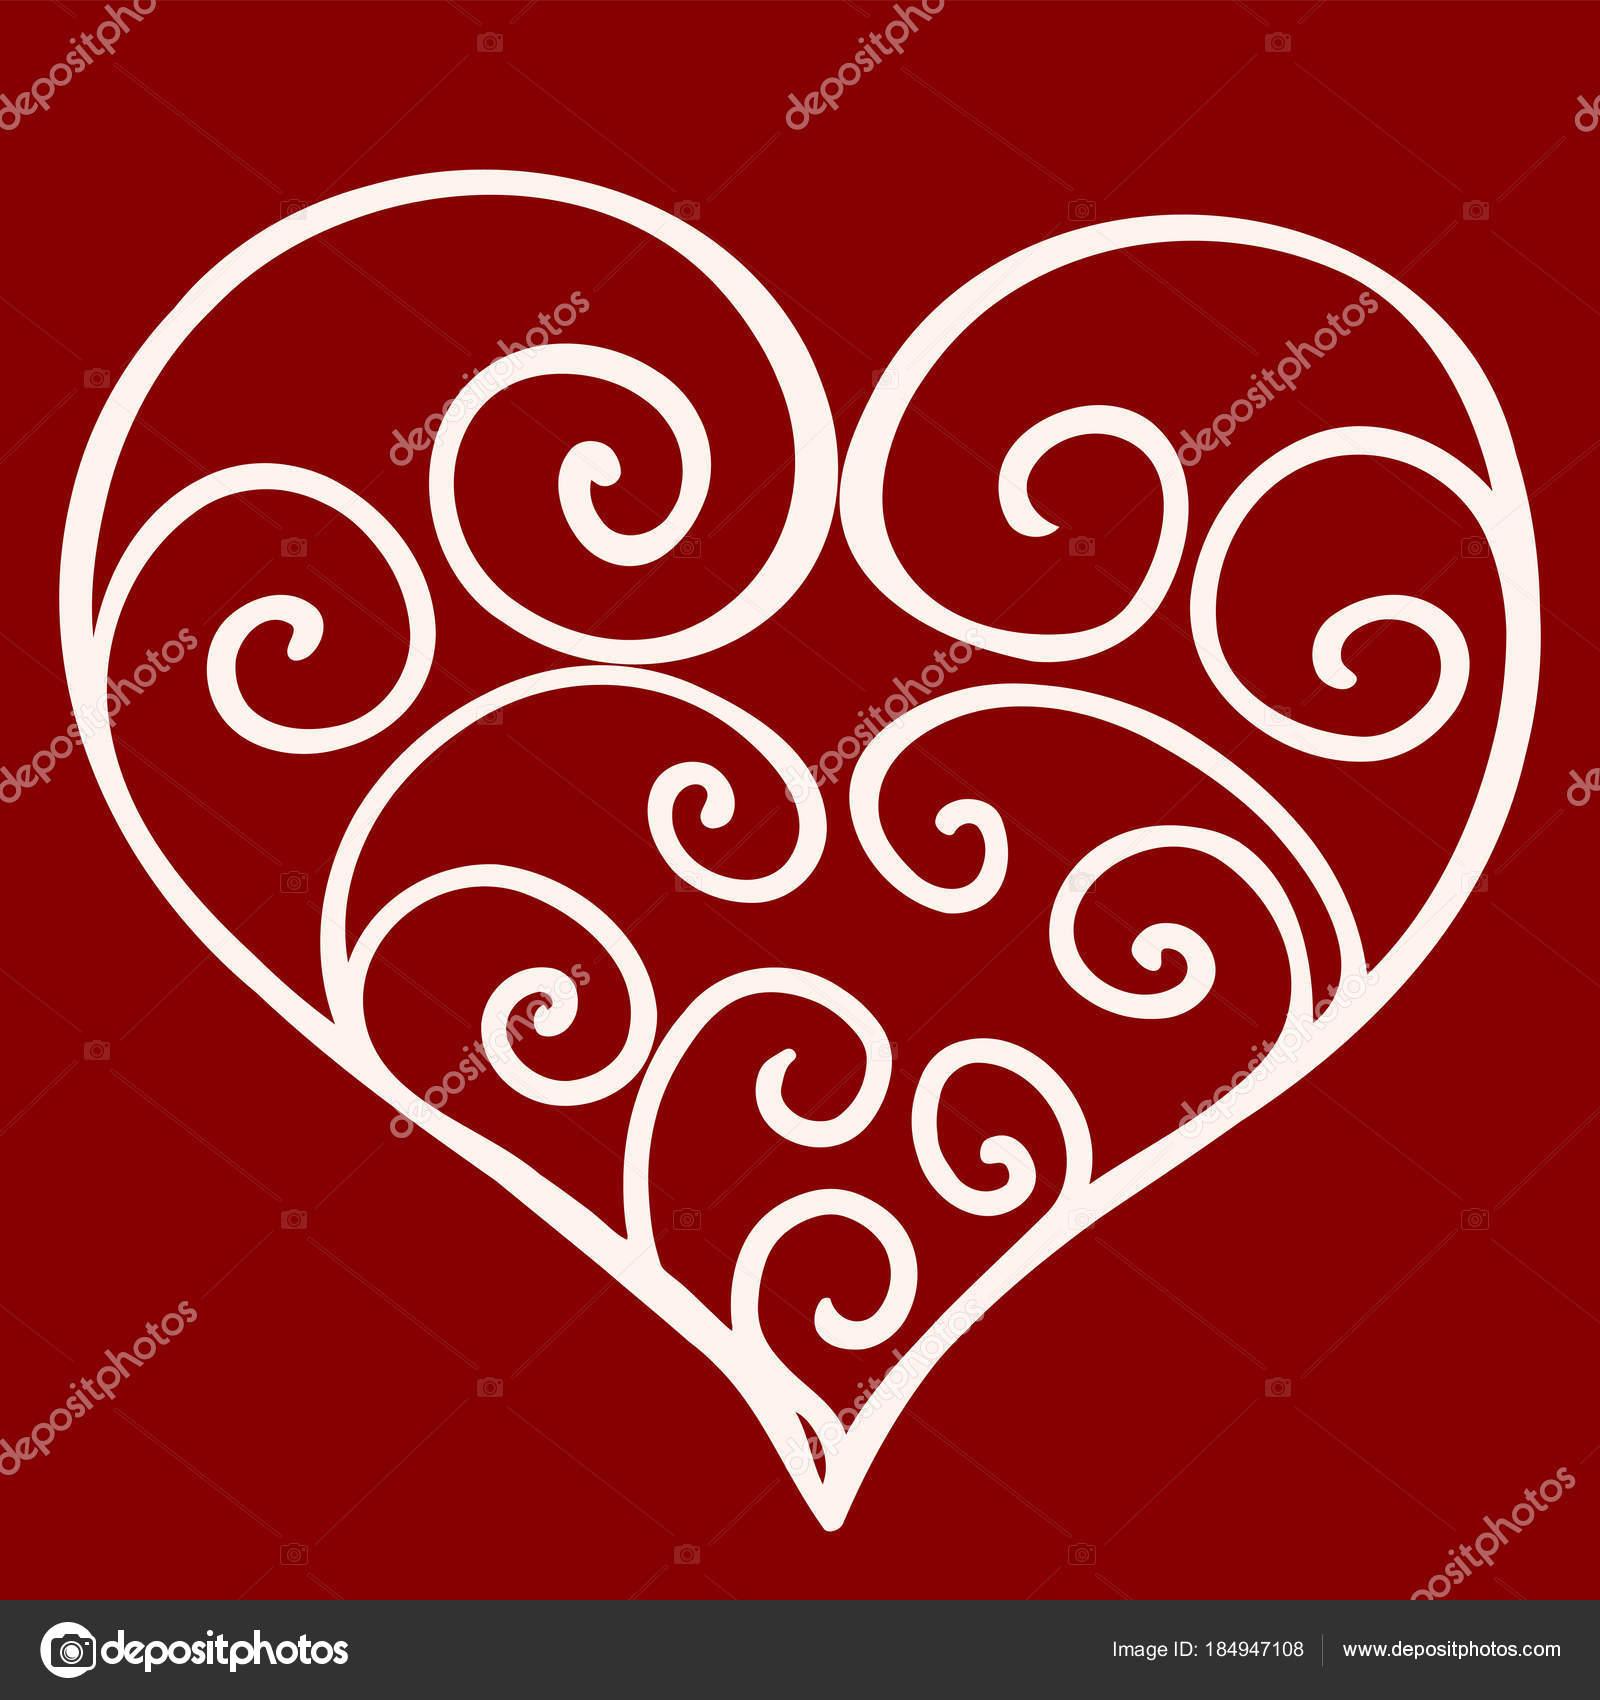 Heart Shape For Love Symbols Decorative Stock Illustration Stock